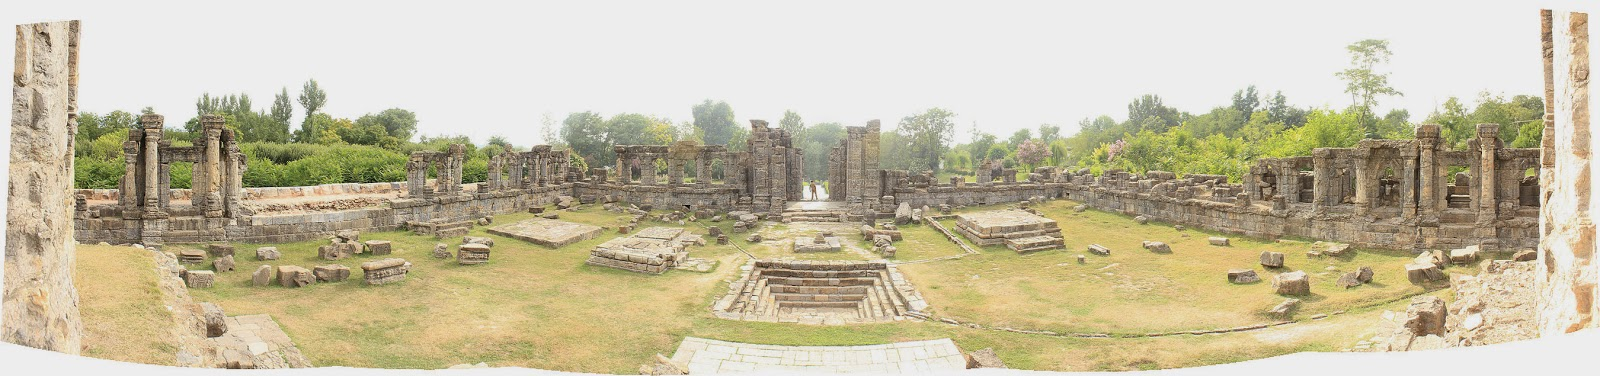 मार्तंड सूर्य मंदिर (Martand Sun Temple)